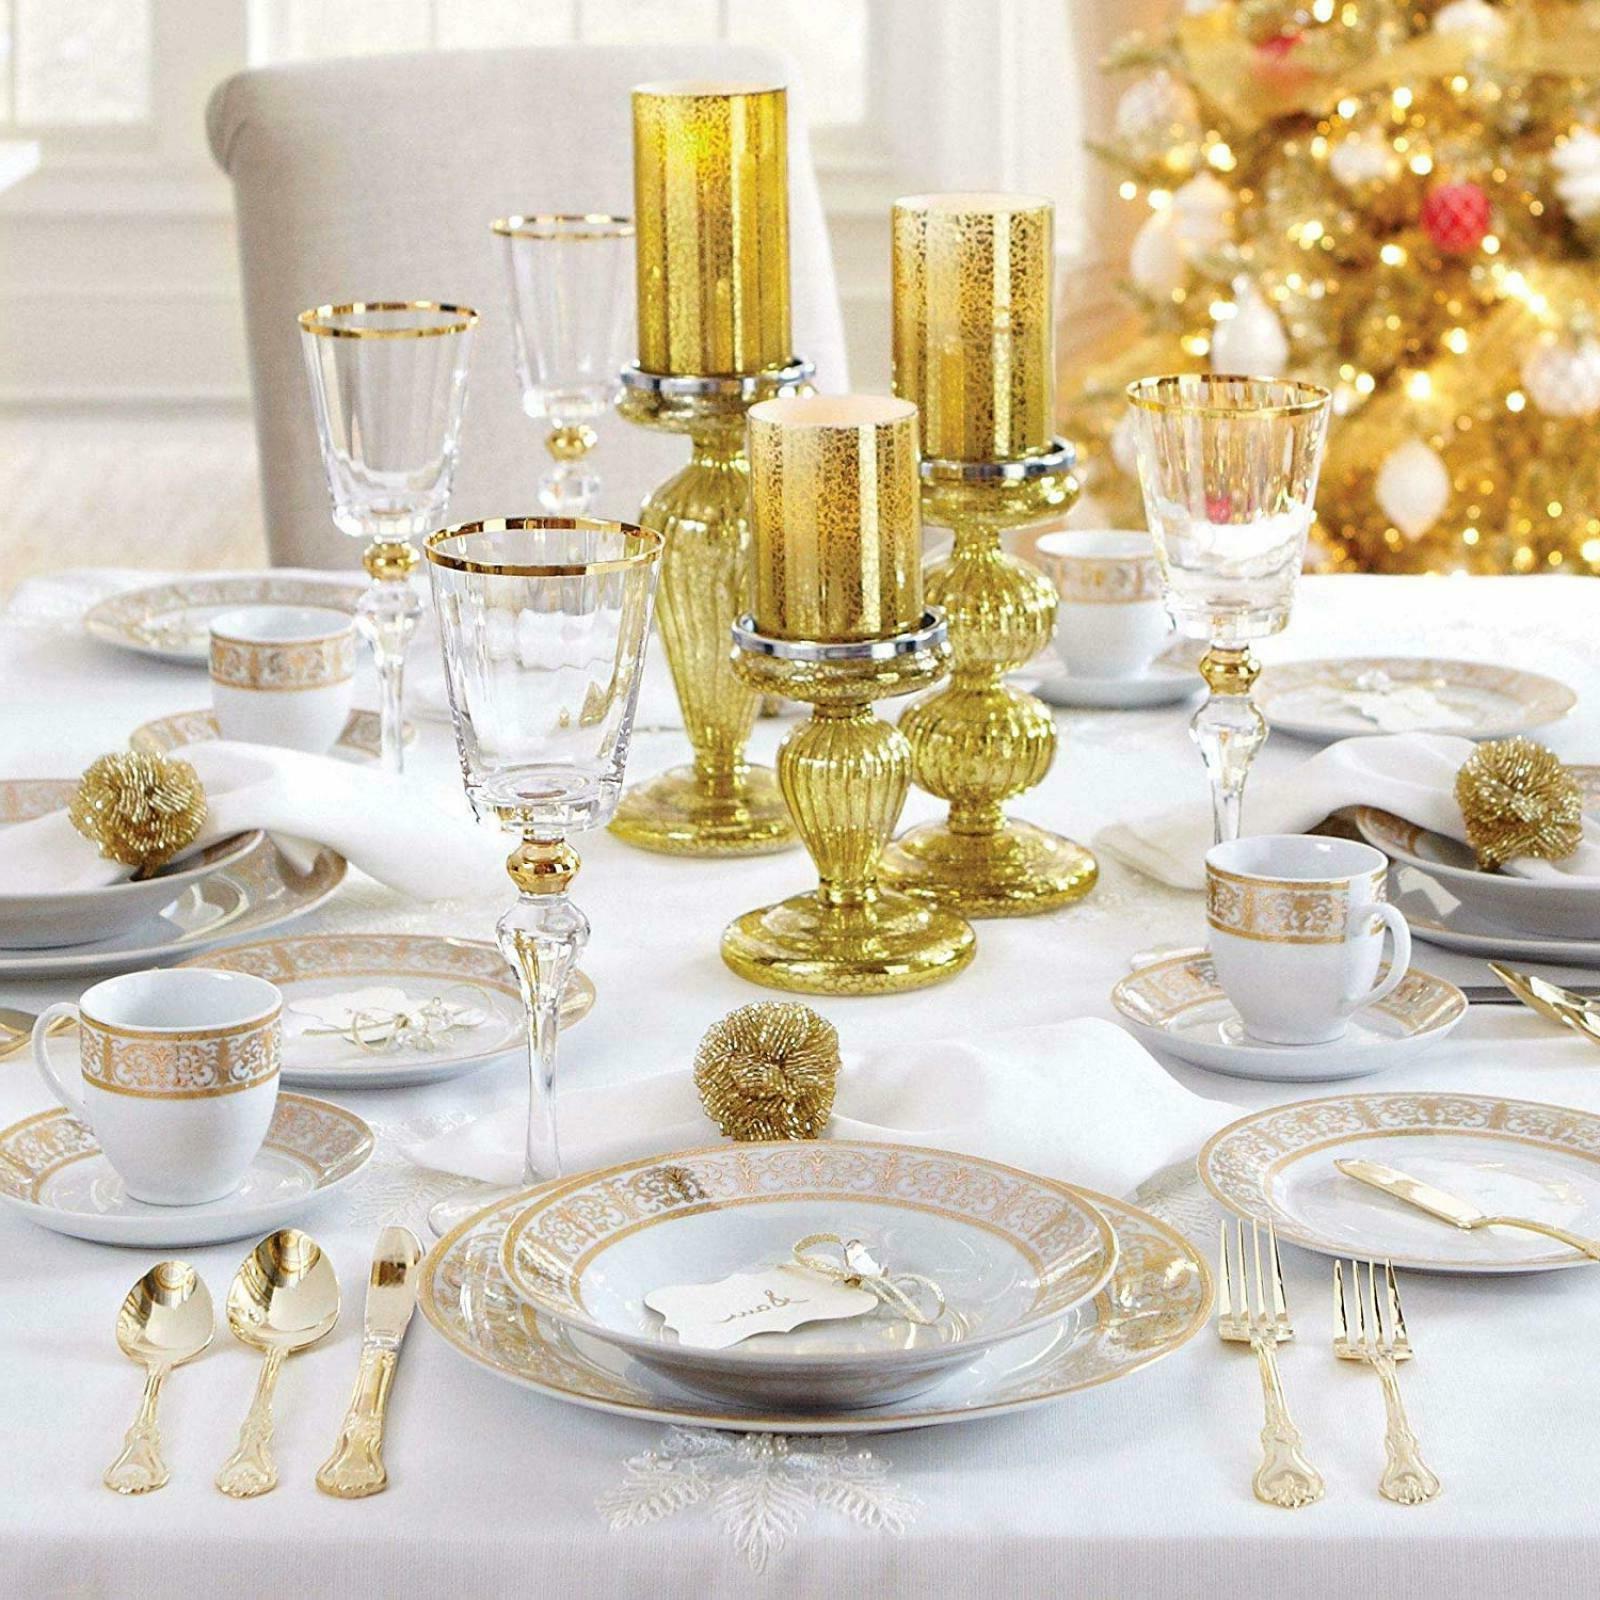 40 Piece Dinnerware Set Kitching Ceramic Dining Set Vintage